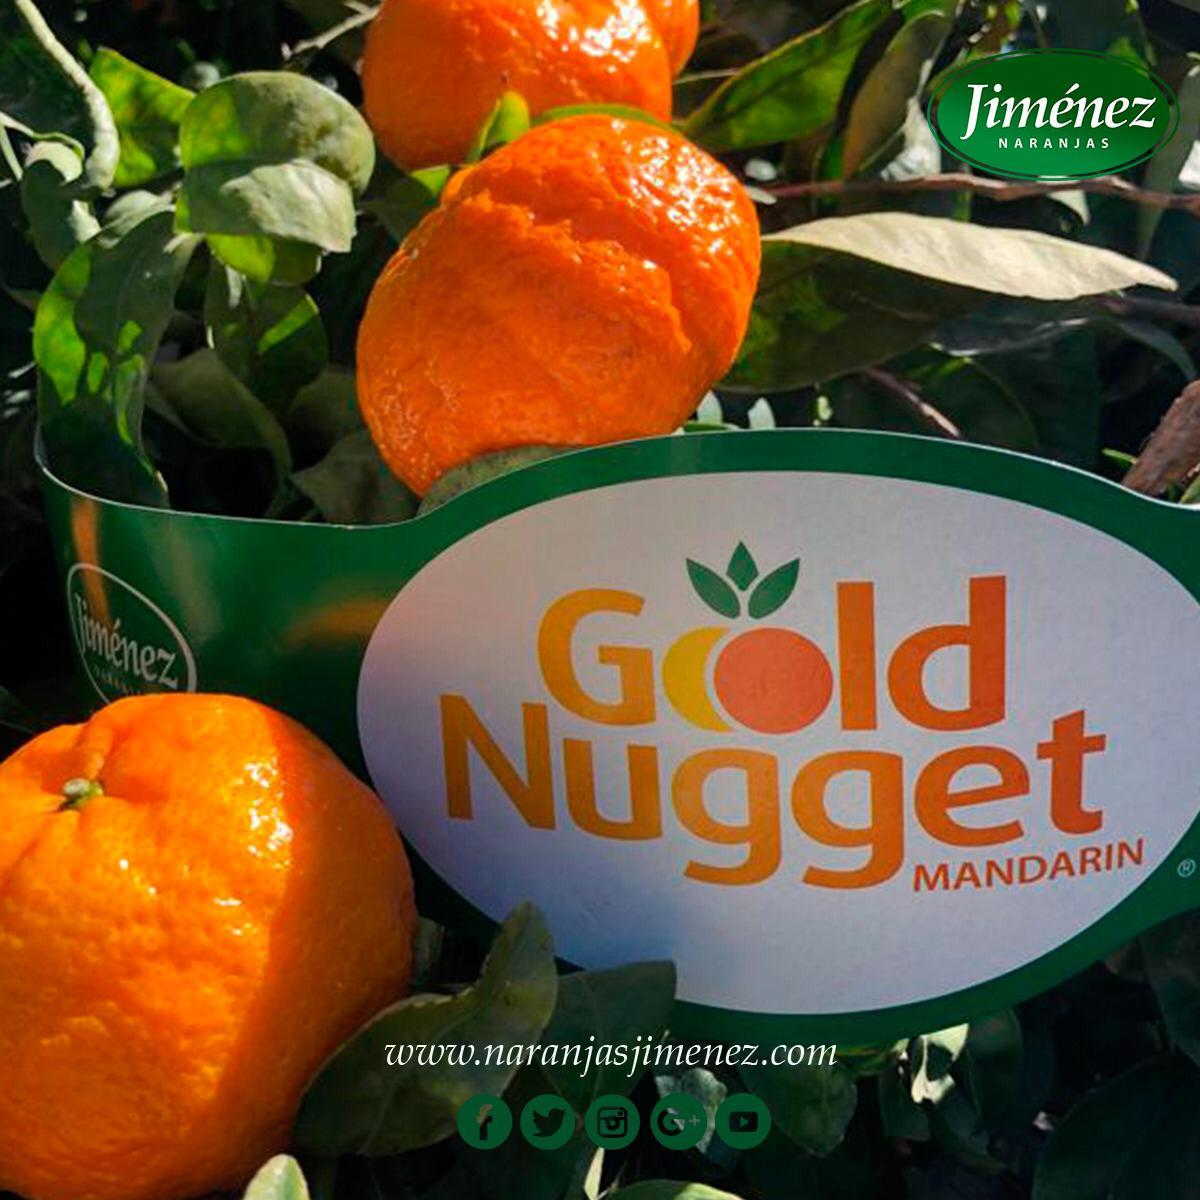 Naranjas Jimenez - Mandarina Gold Nugget